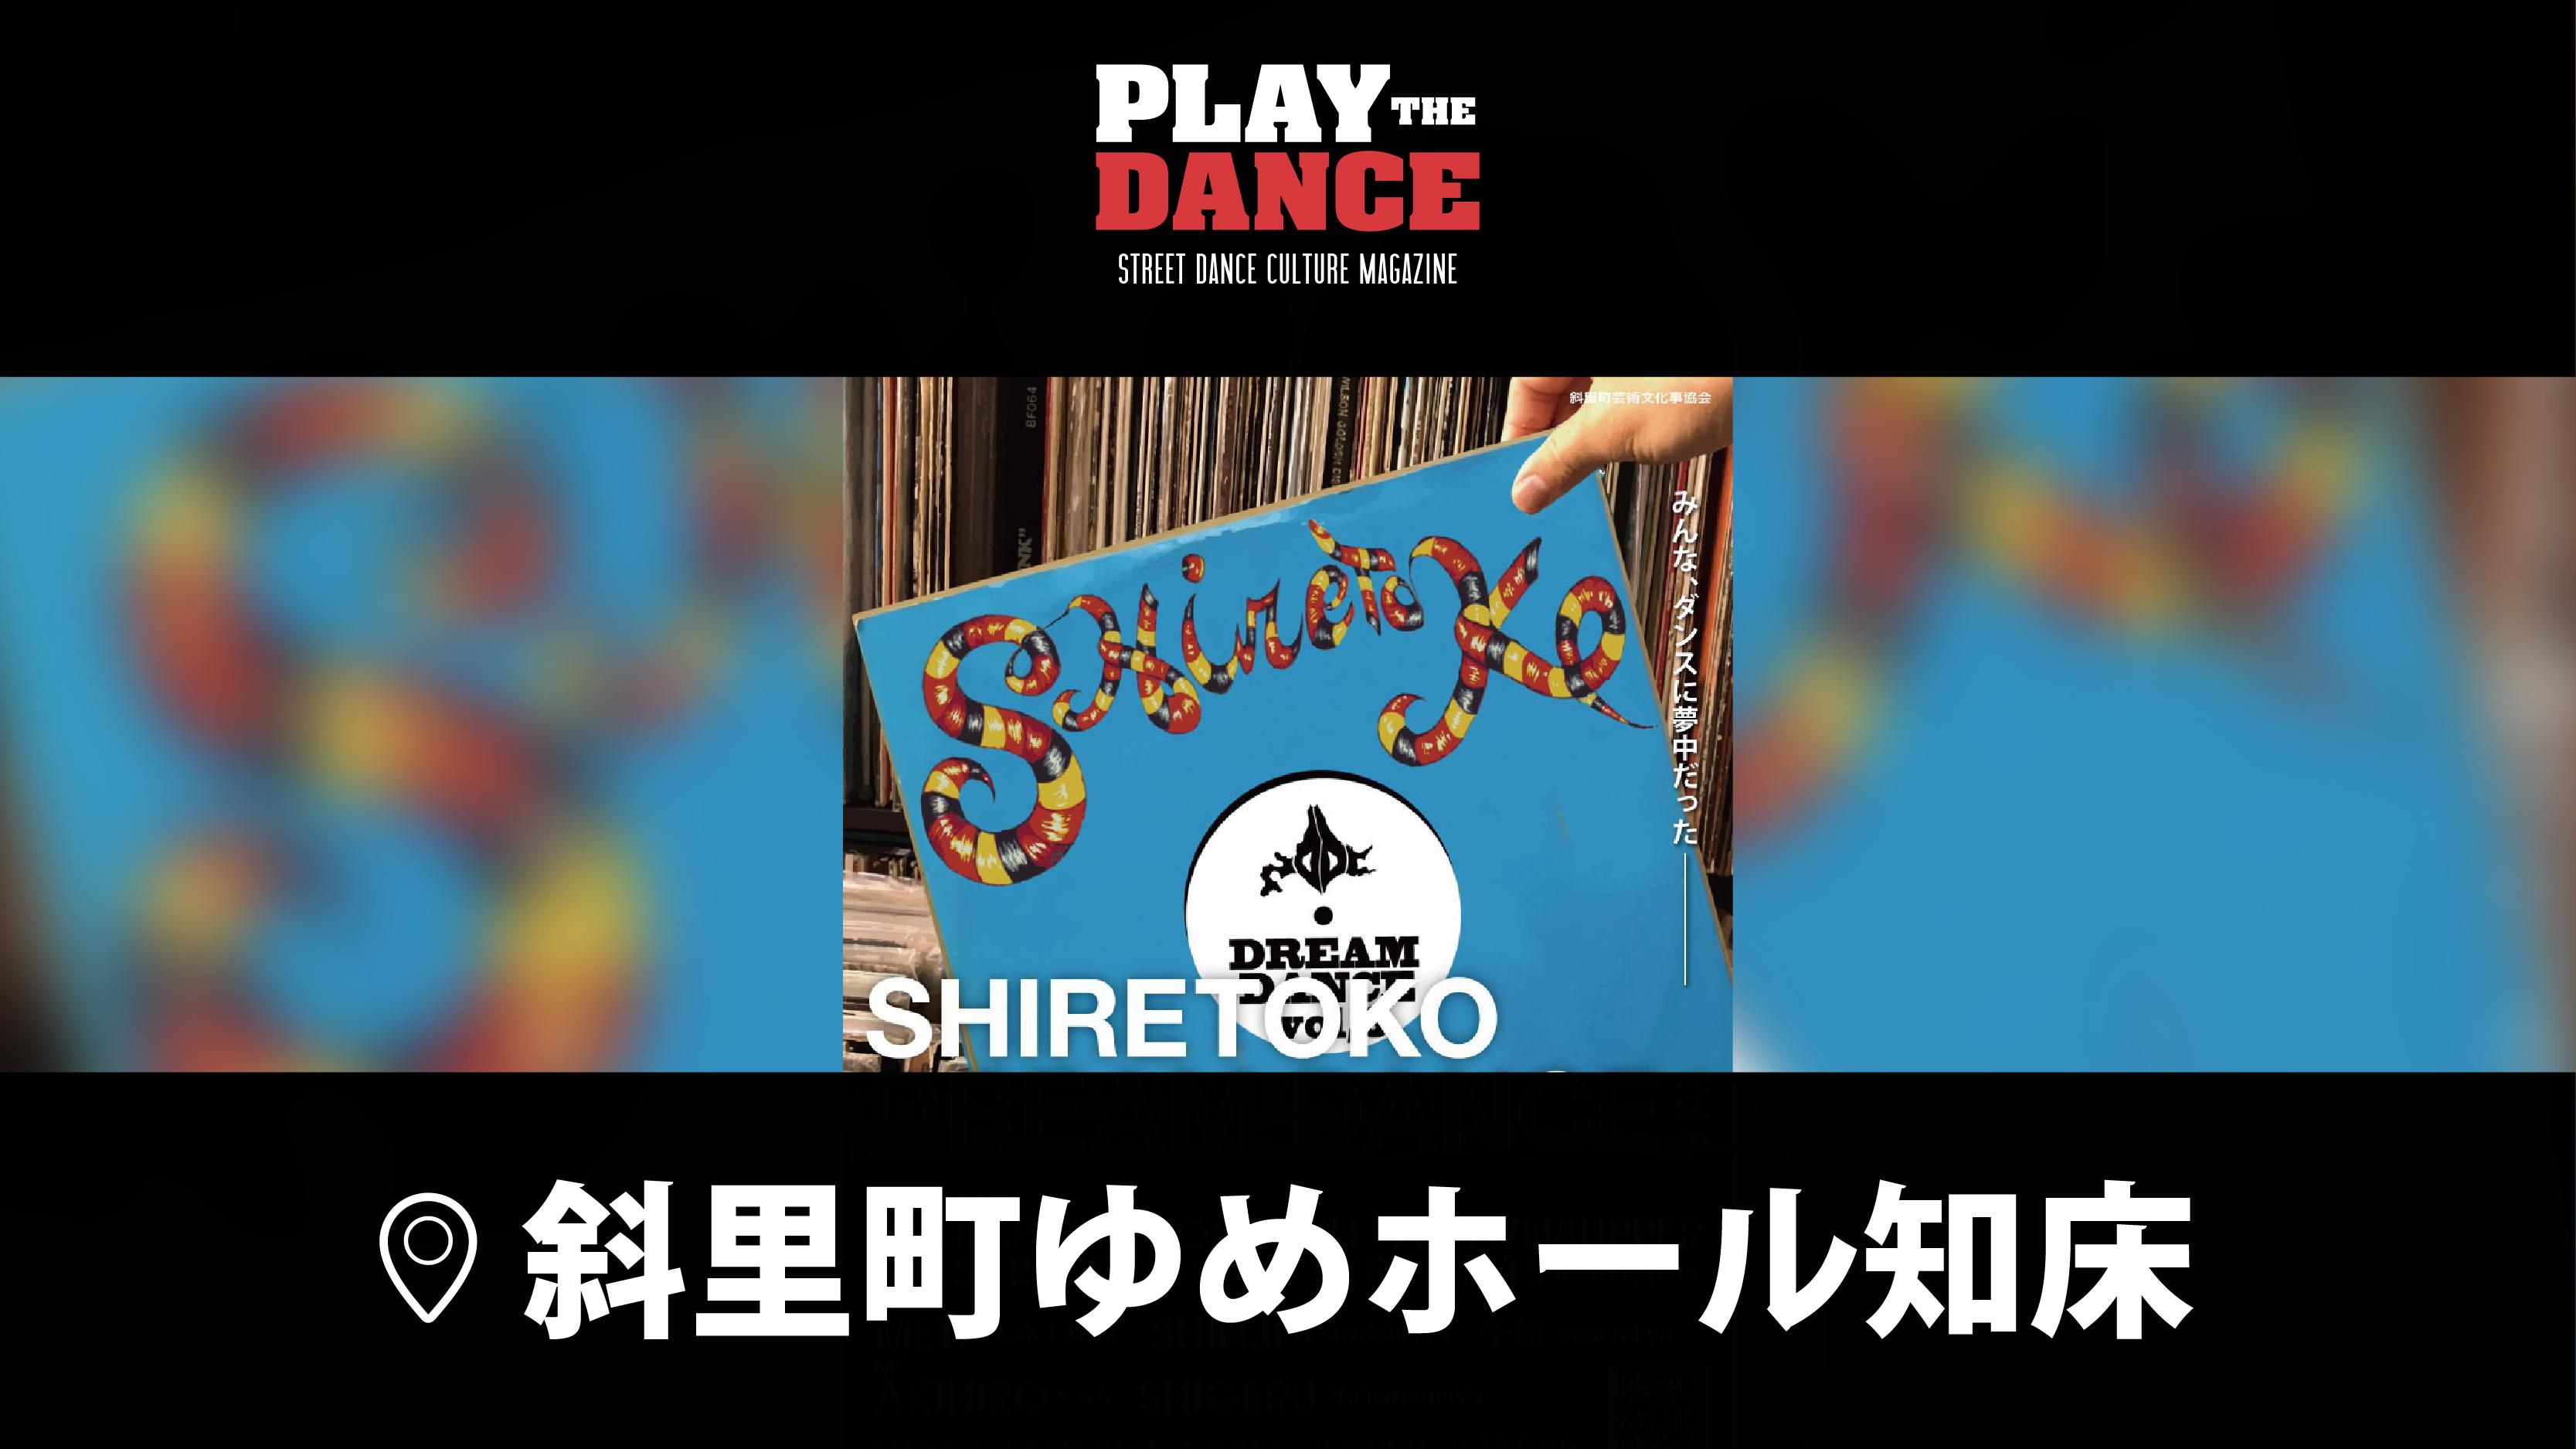 SHIRETOKO DREAM DANCE vol.6